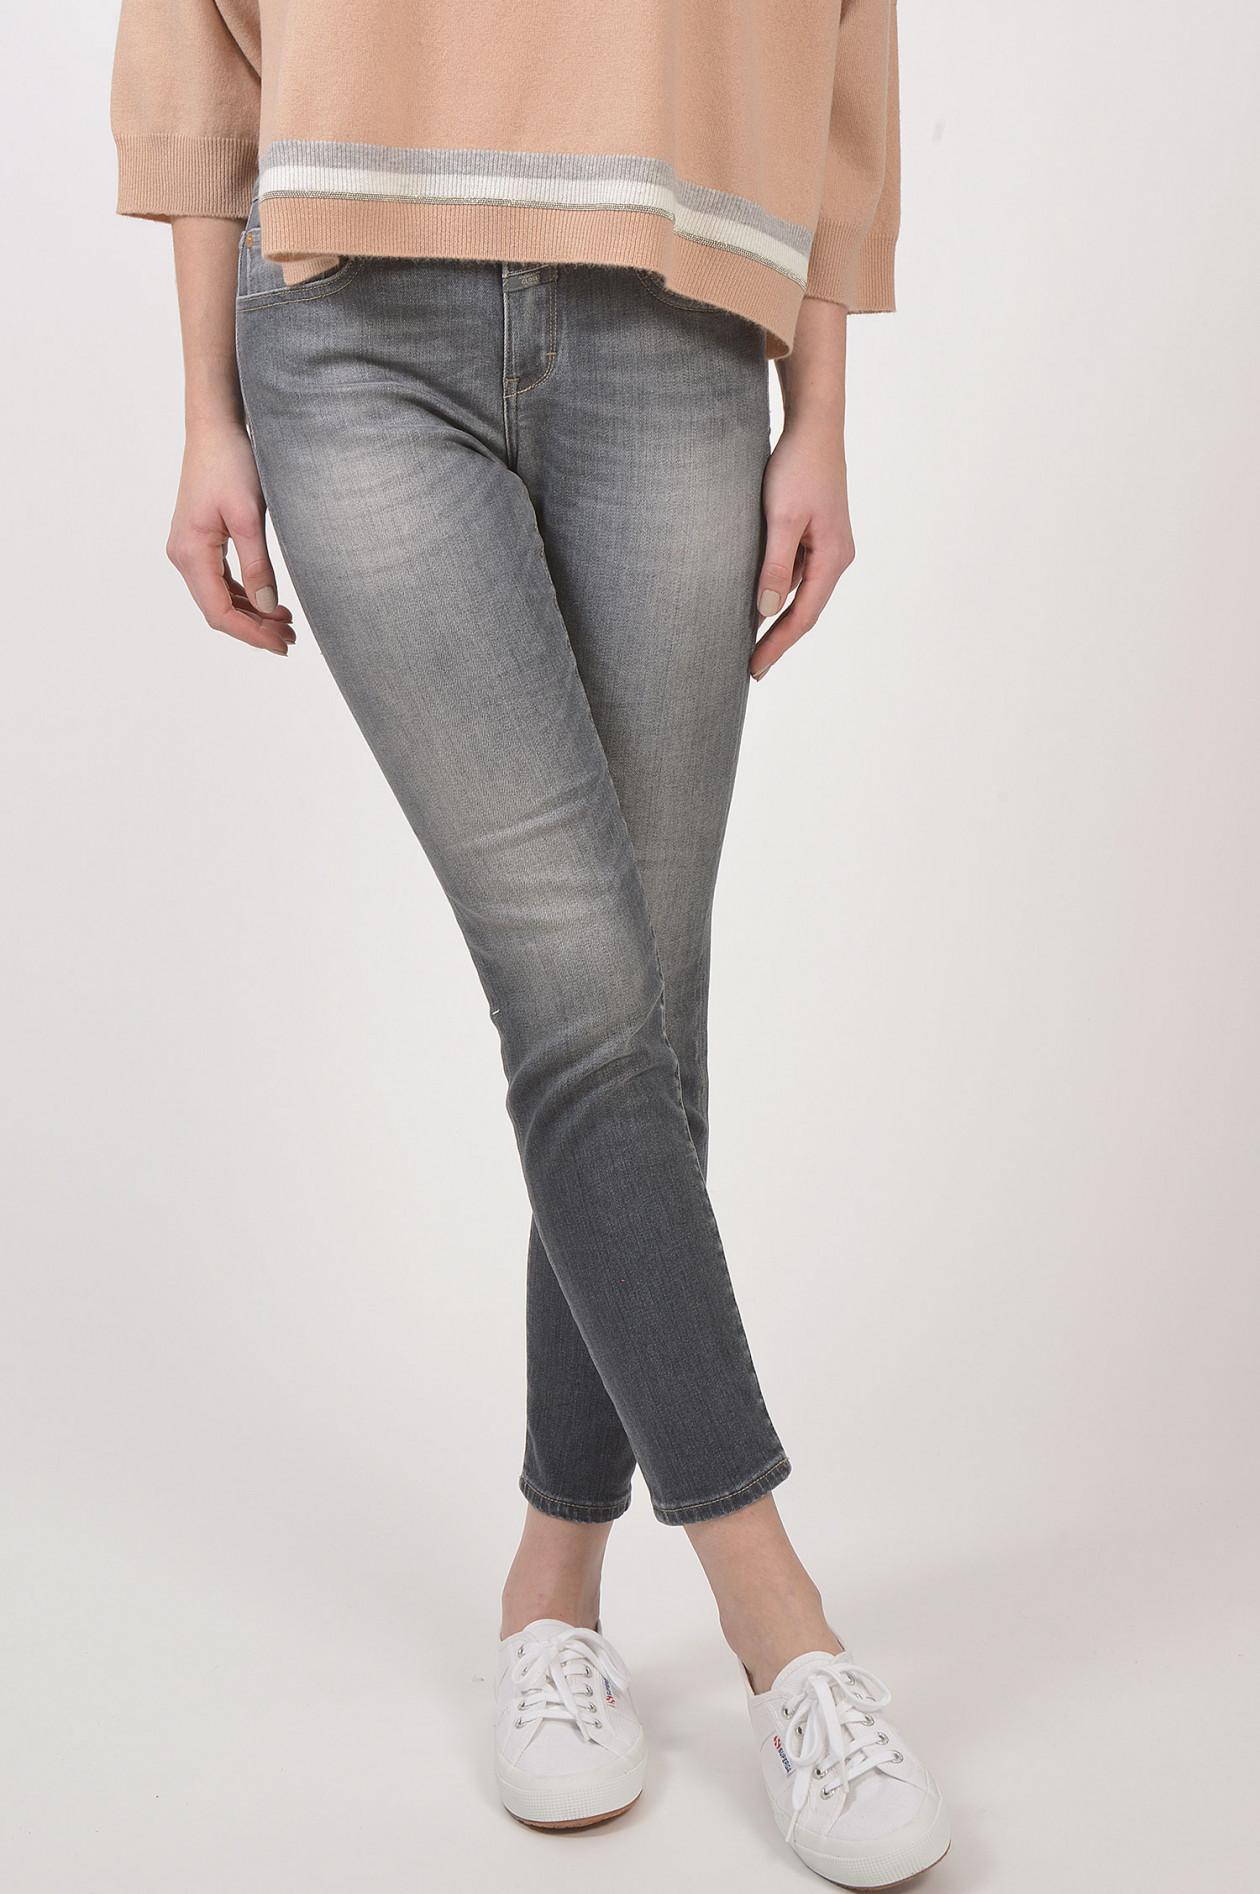 ClosedBaker – Slim Fit Jeans mit Stretch Anteil Modell 'Baker'